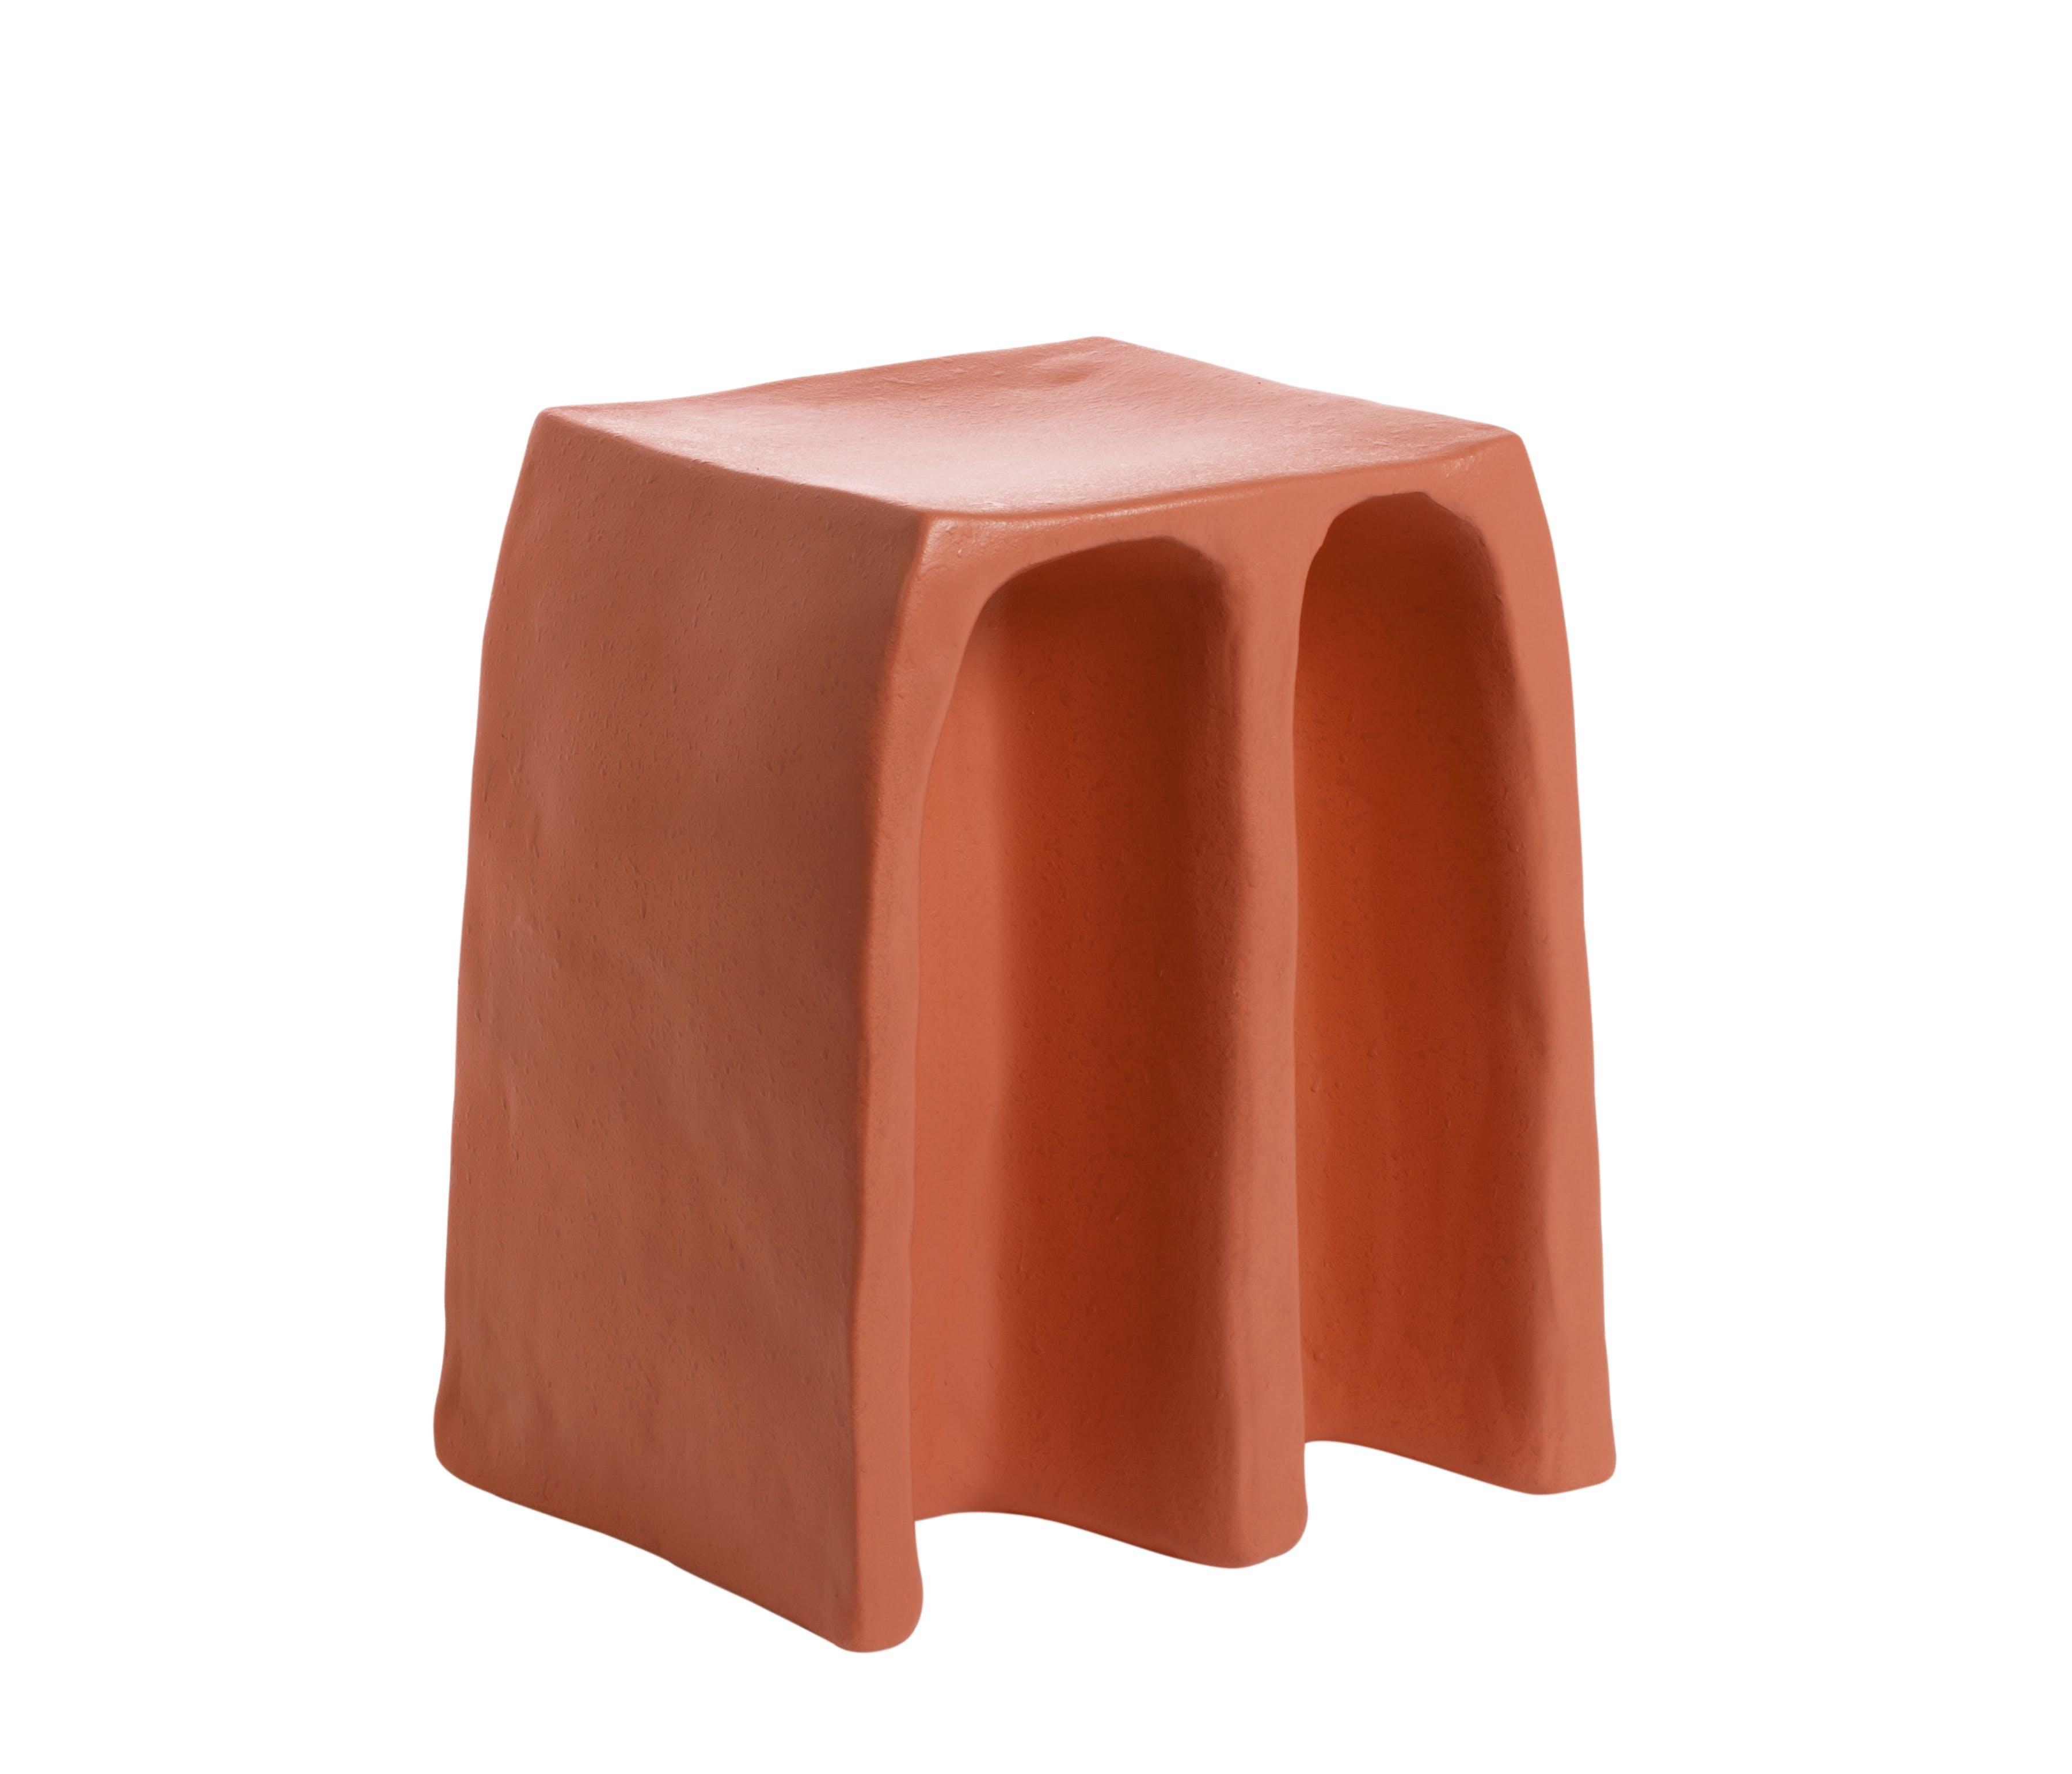 Pulpo-chouchou-stool-red-haute-living